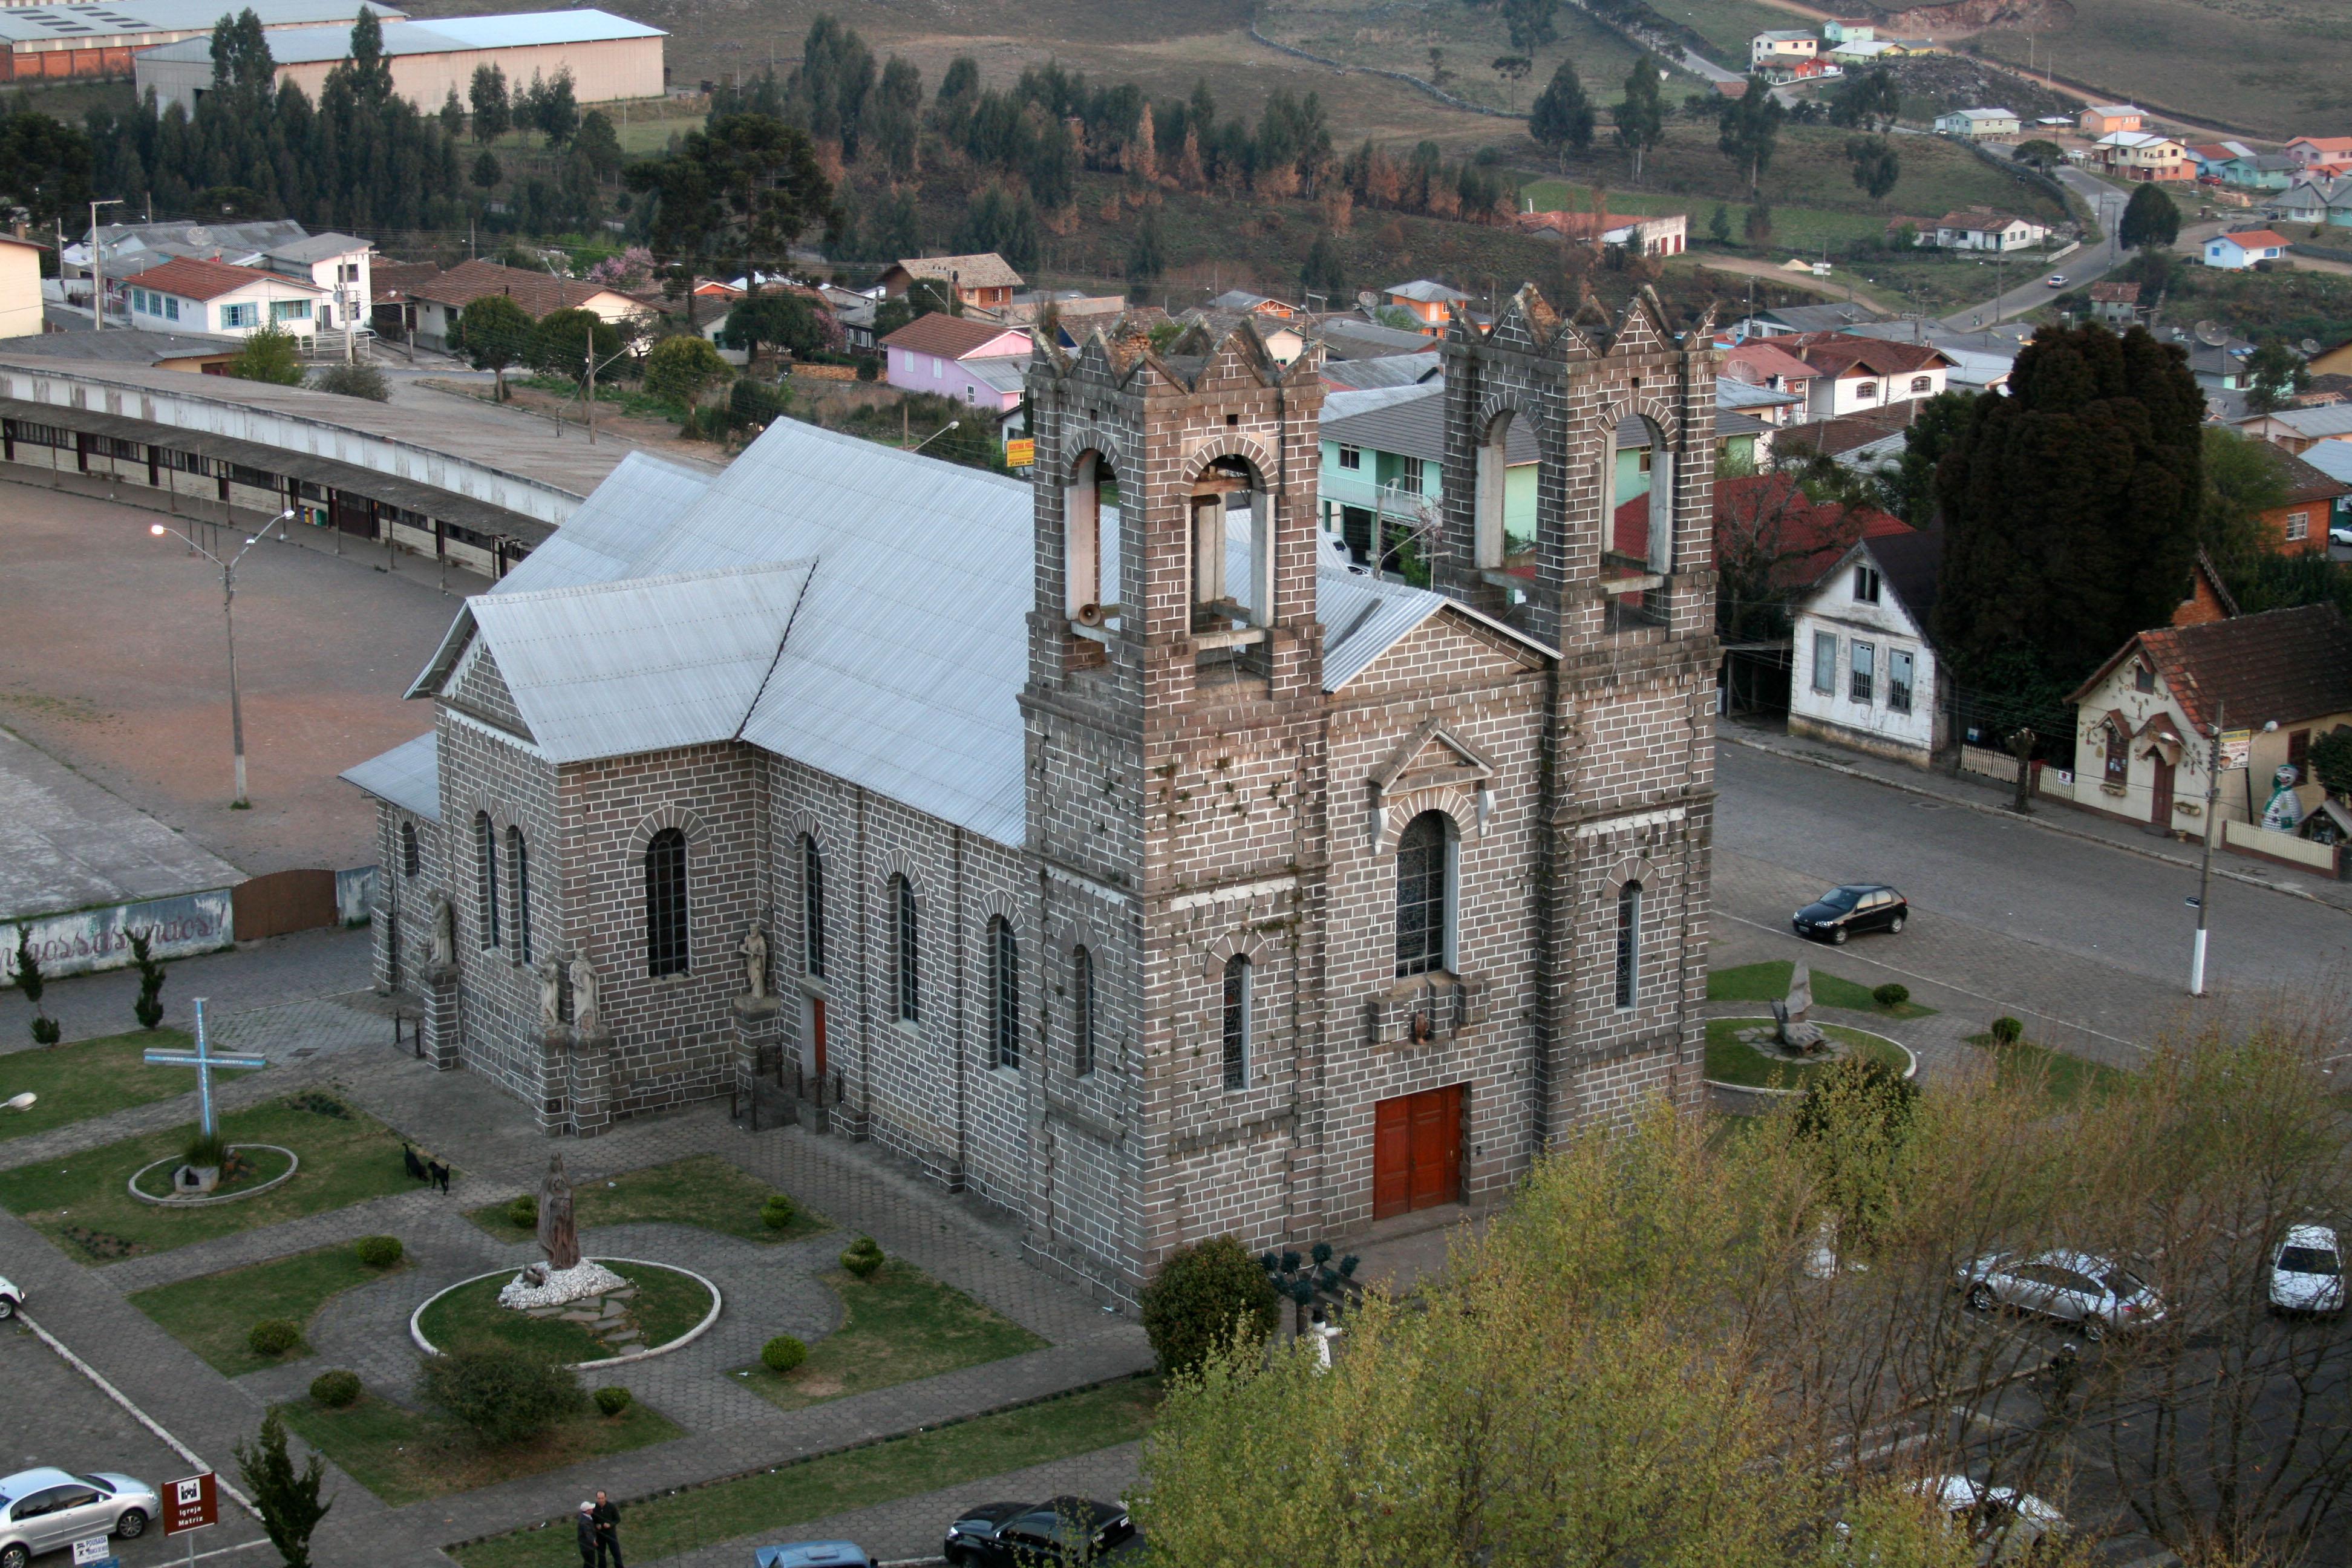 São Joaquim Santa Catarina fonte: upload.wikimedia.org